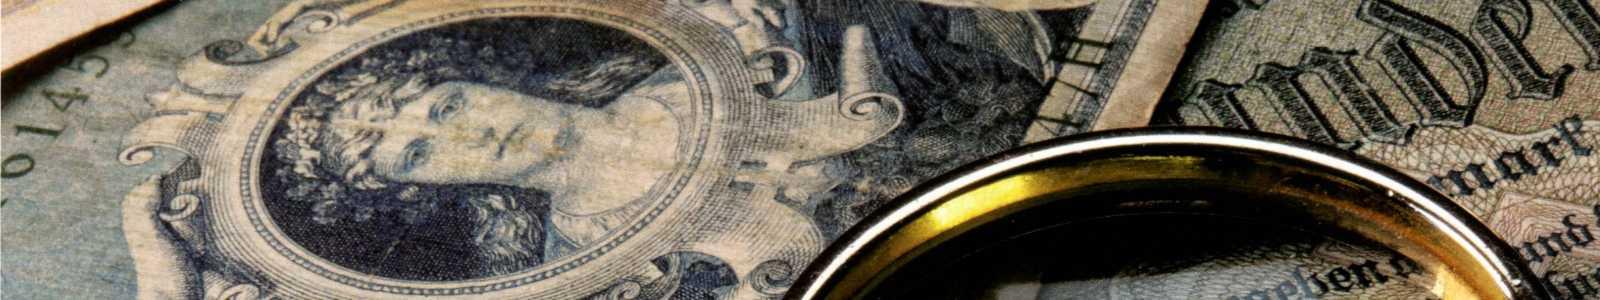 Gallery ANDREY PYATYGIN ANCIENT COINS LLC